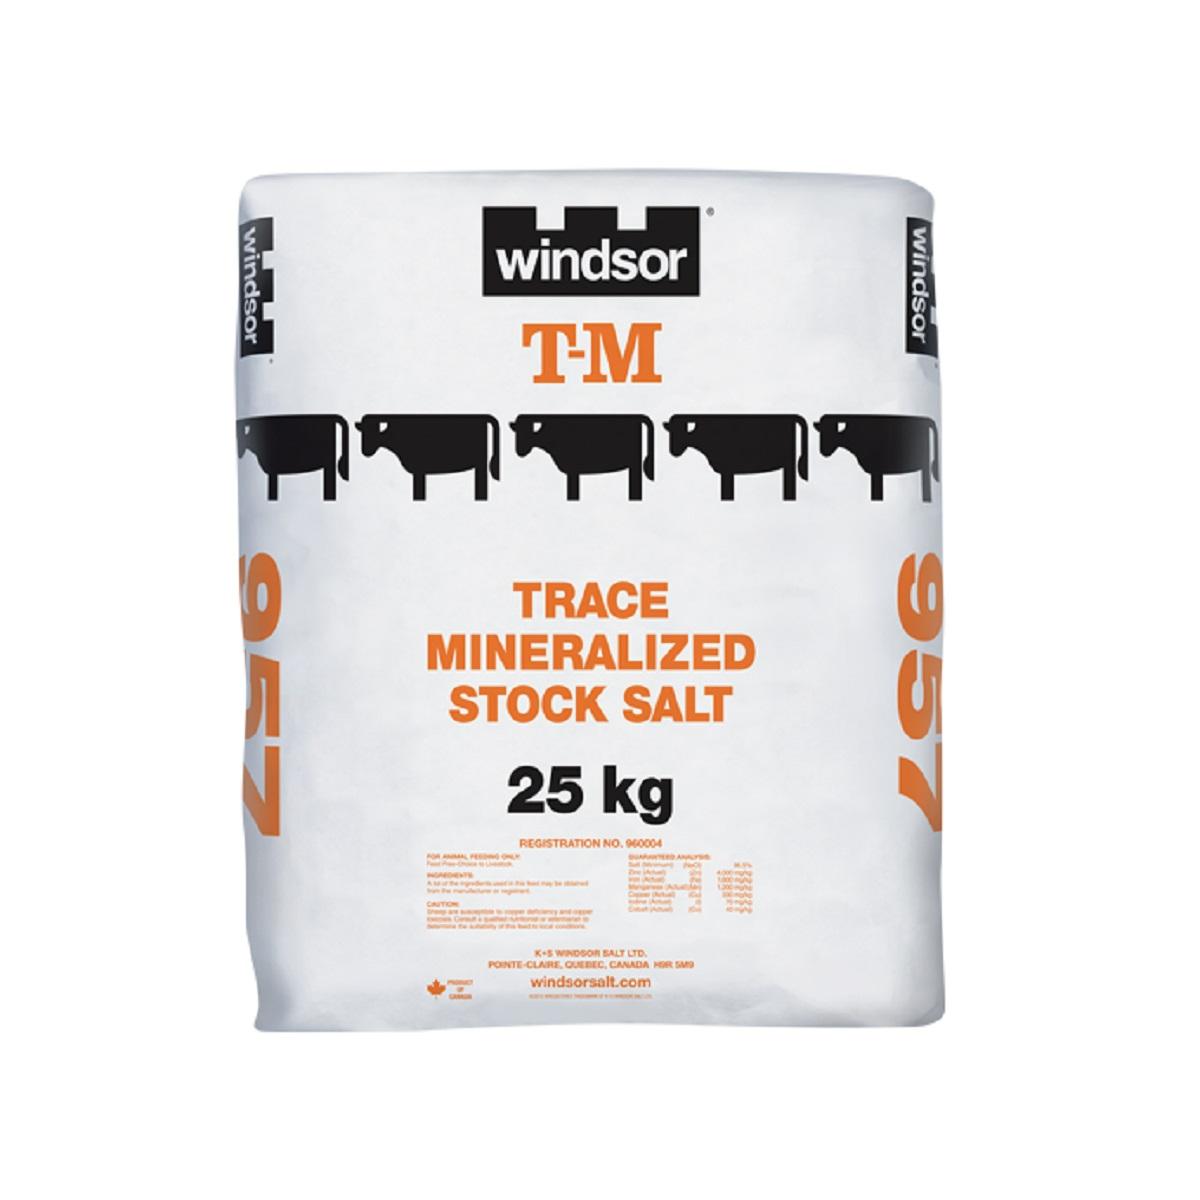 Windsor Trace Mineralized Stock Salt - T.M. - 25 kg